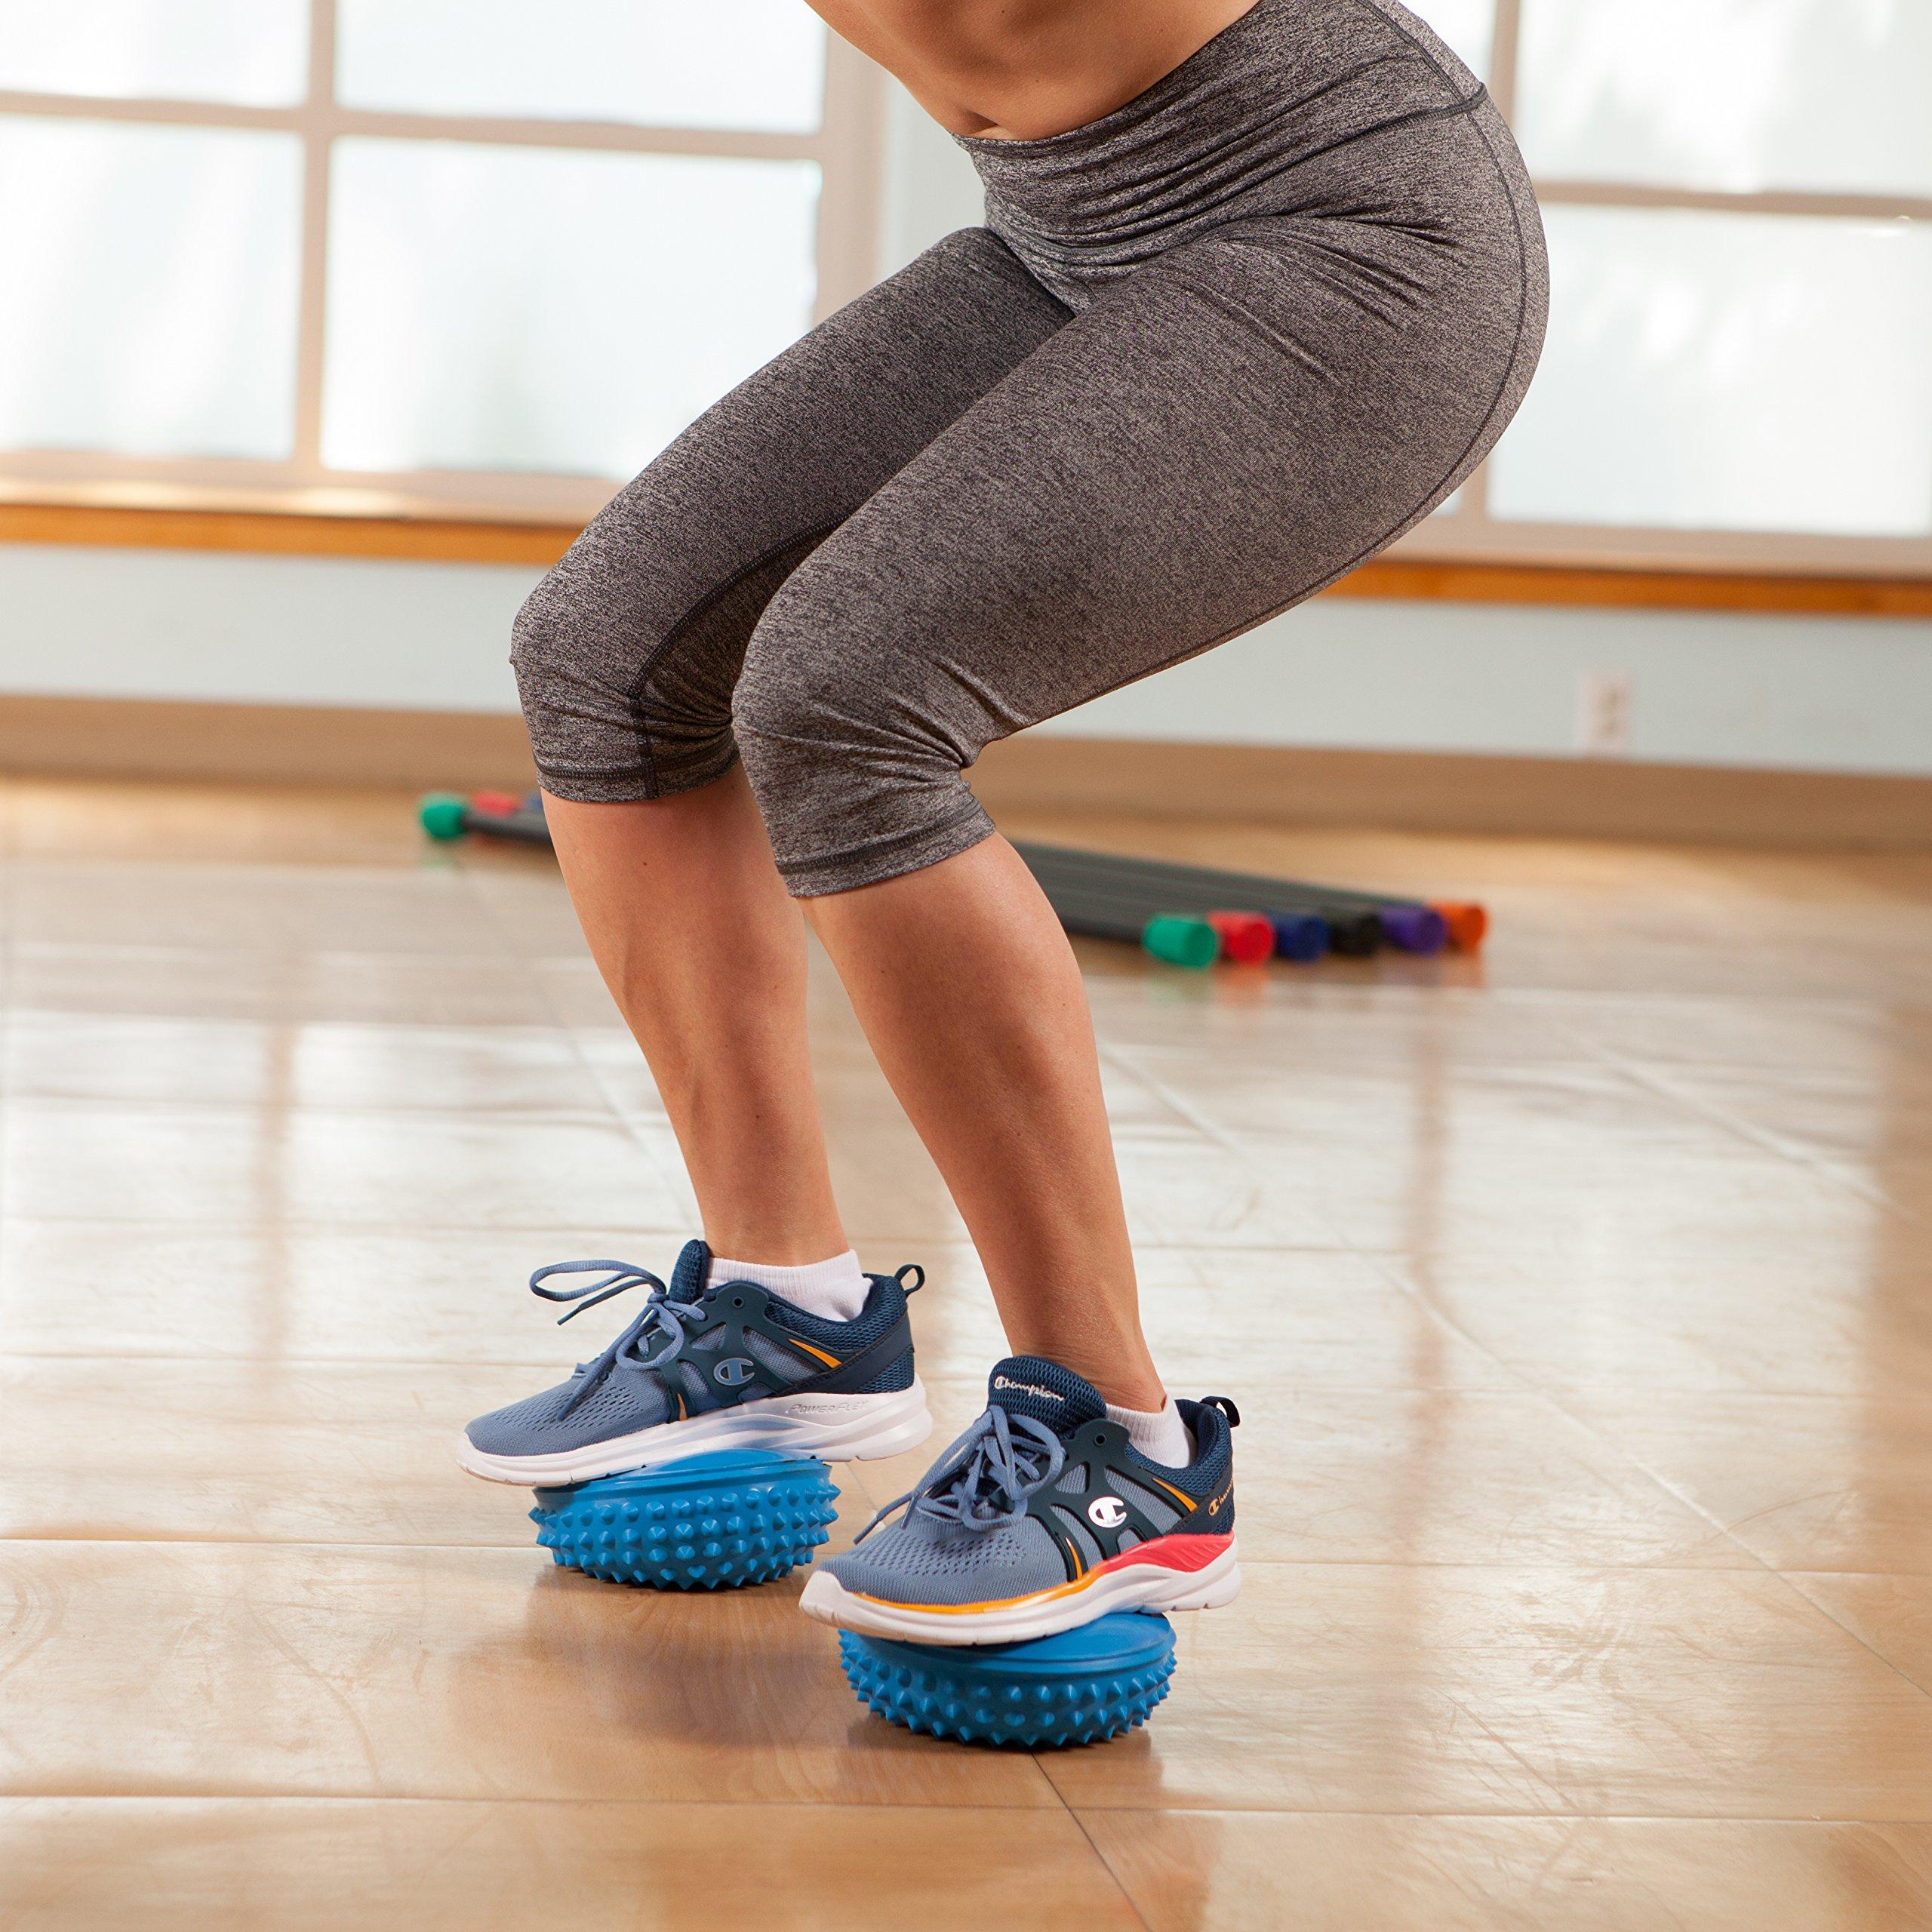 JFIT j//fit Balance Pod /& Foot Fitness Set Includes 4 Pods